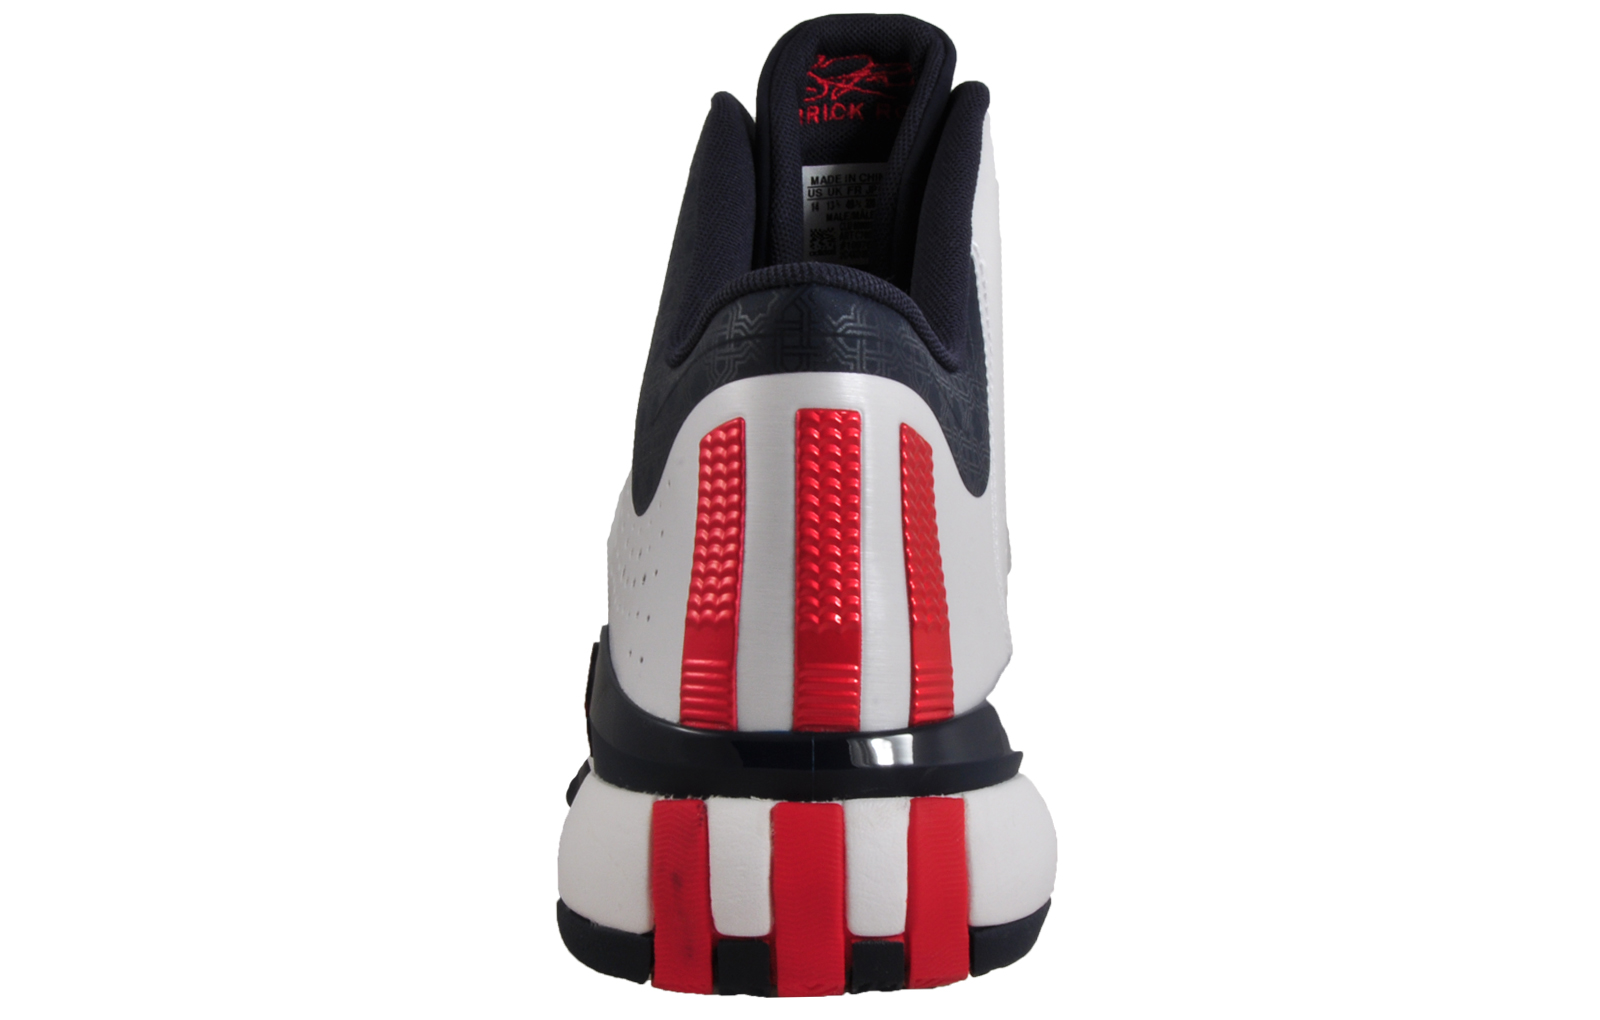 timeless design d2ae0 ee902 Adidas D Rose Derrick Rose Men s Premium Basketball Trainers White